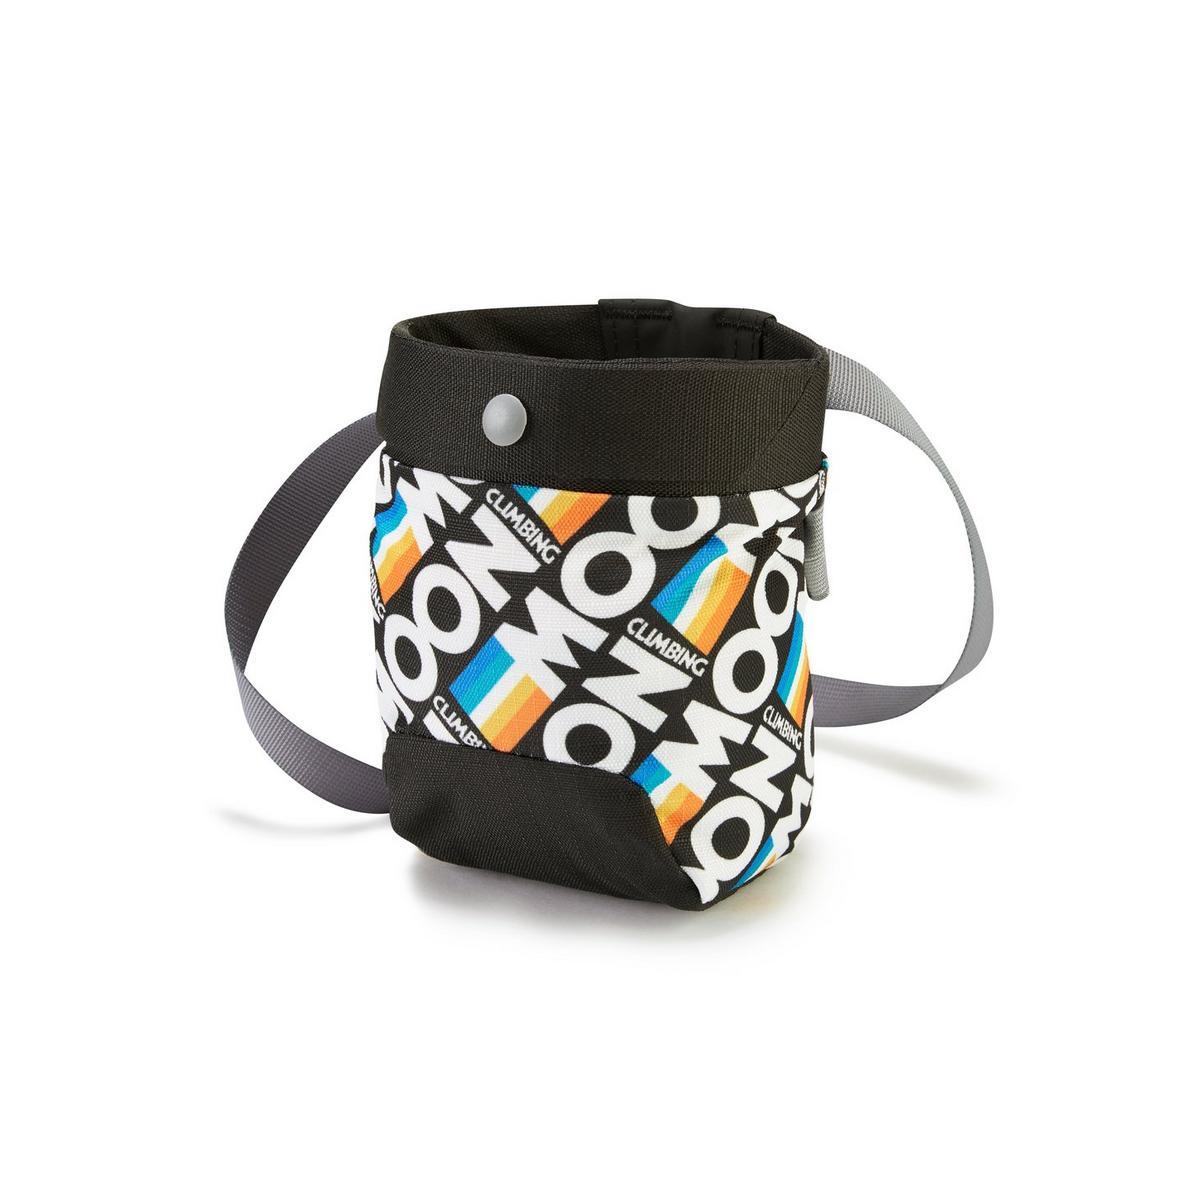 Moon Sport Chalk Bag - Retro Stripe Black